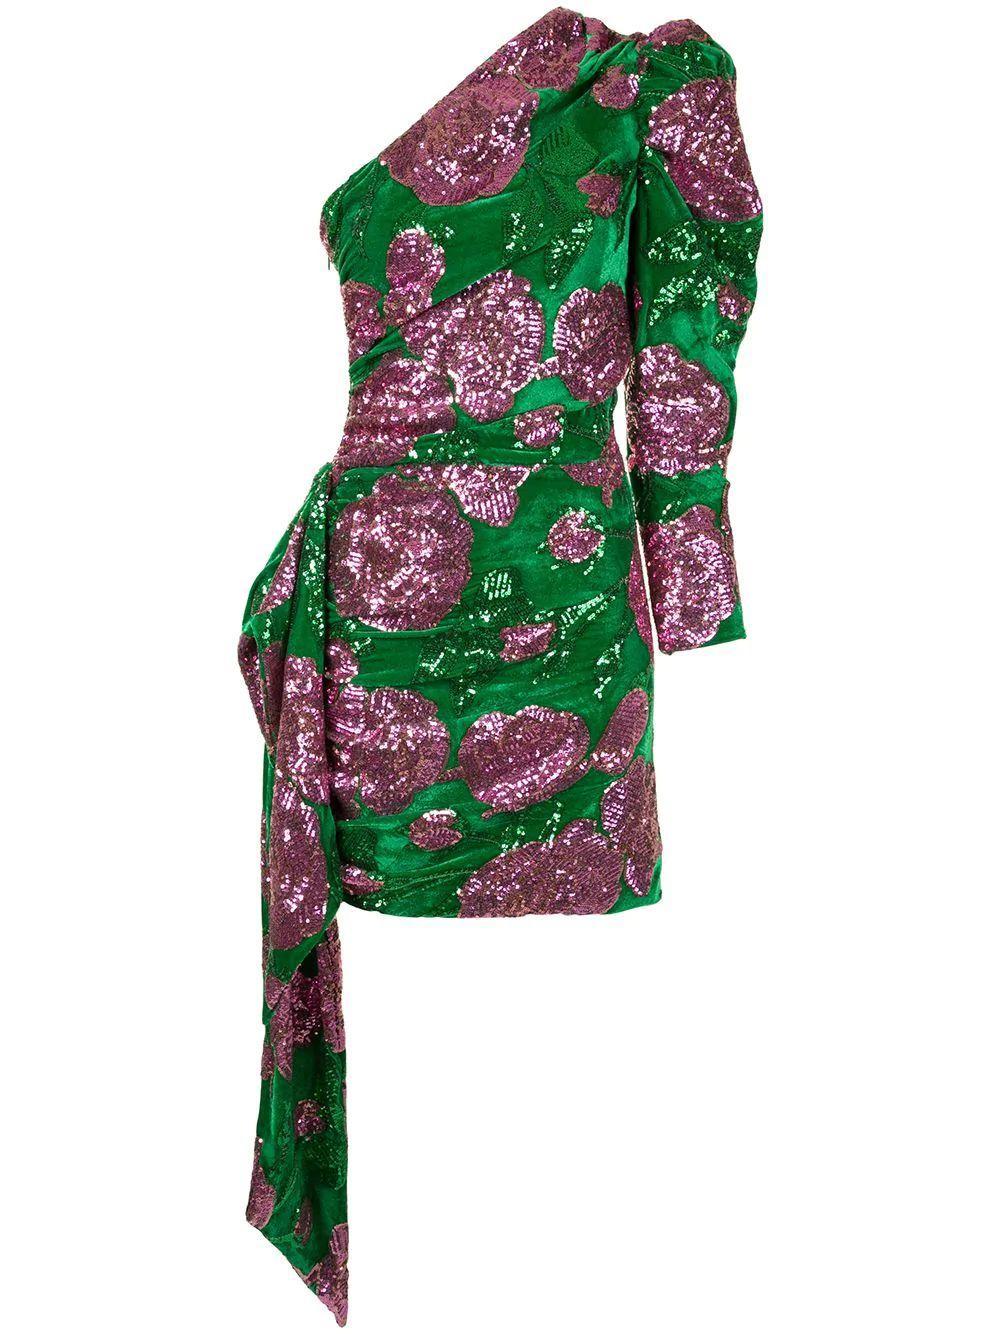 Sequin Embroidered Velvet Dress Item # 100DR-111